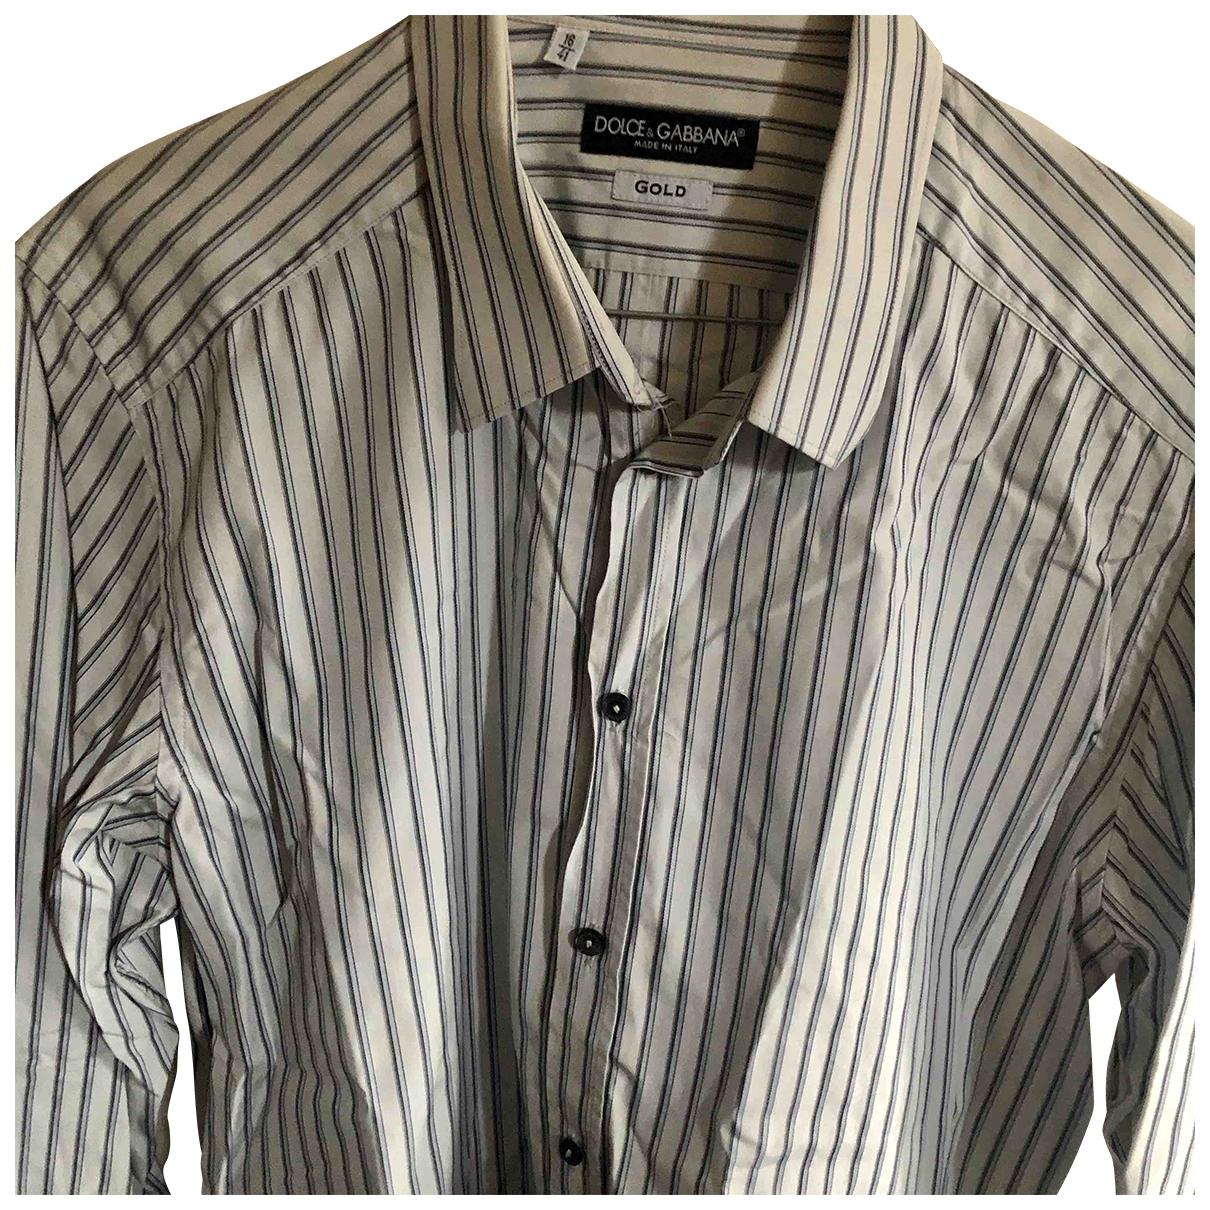 Dolce & Gabbana \N White Cotton Shirts for Men 41 EU (tour de cou / collar)